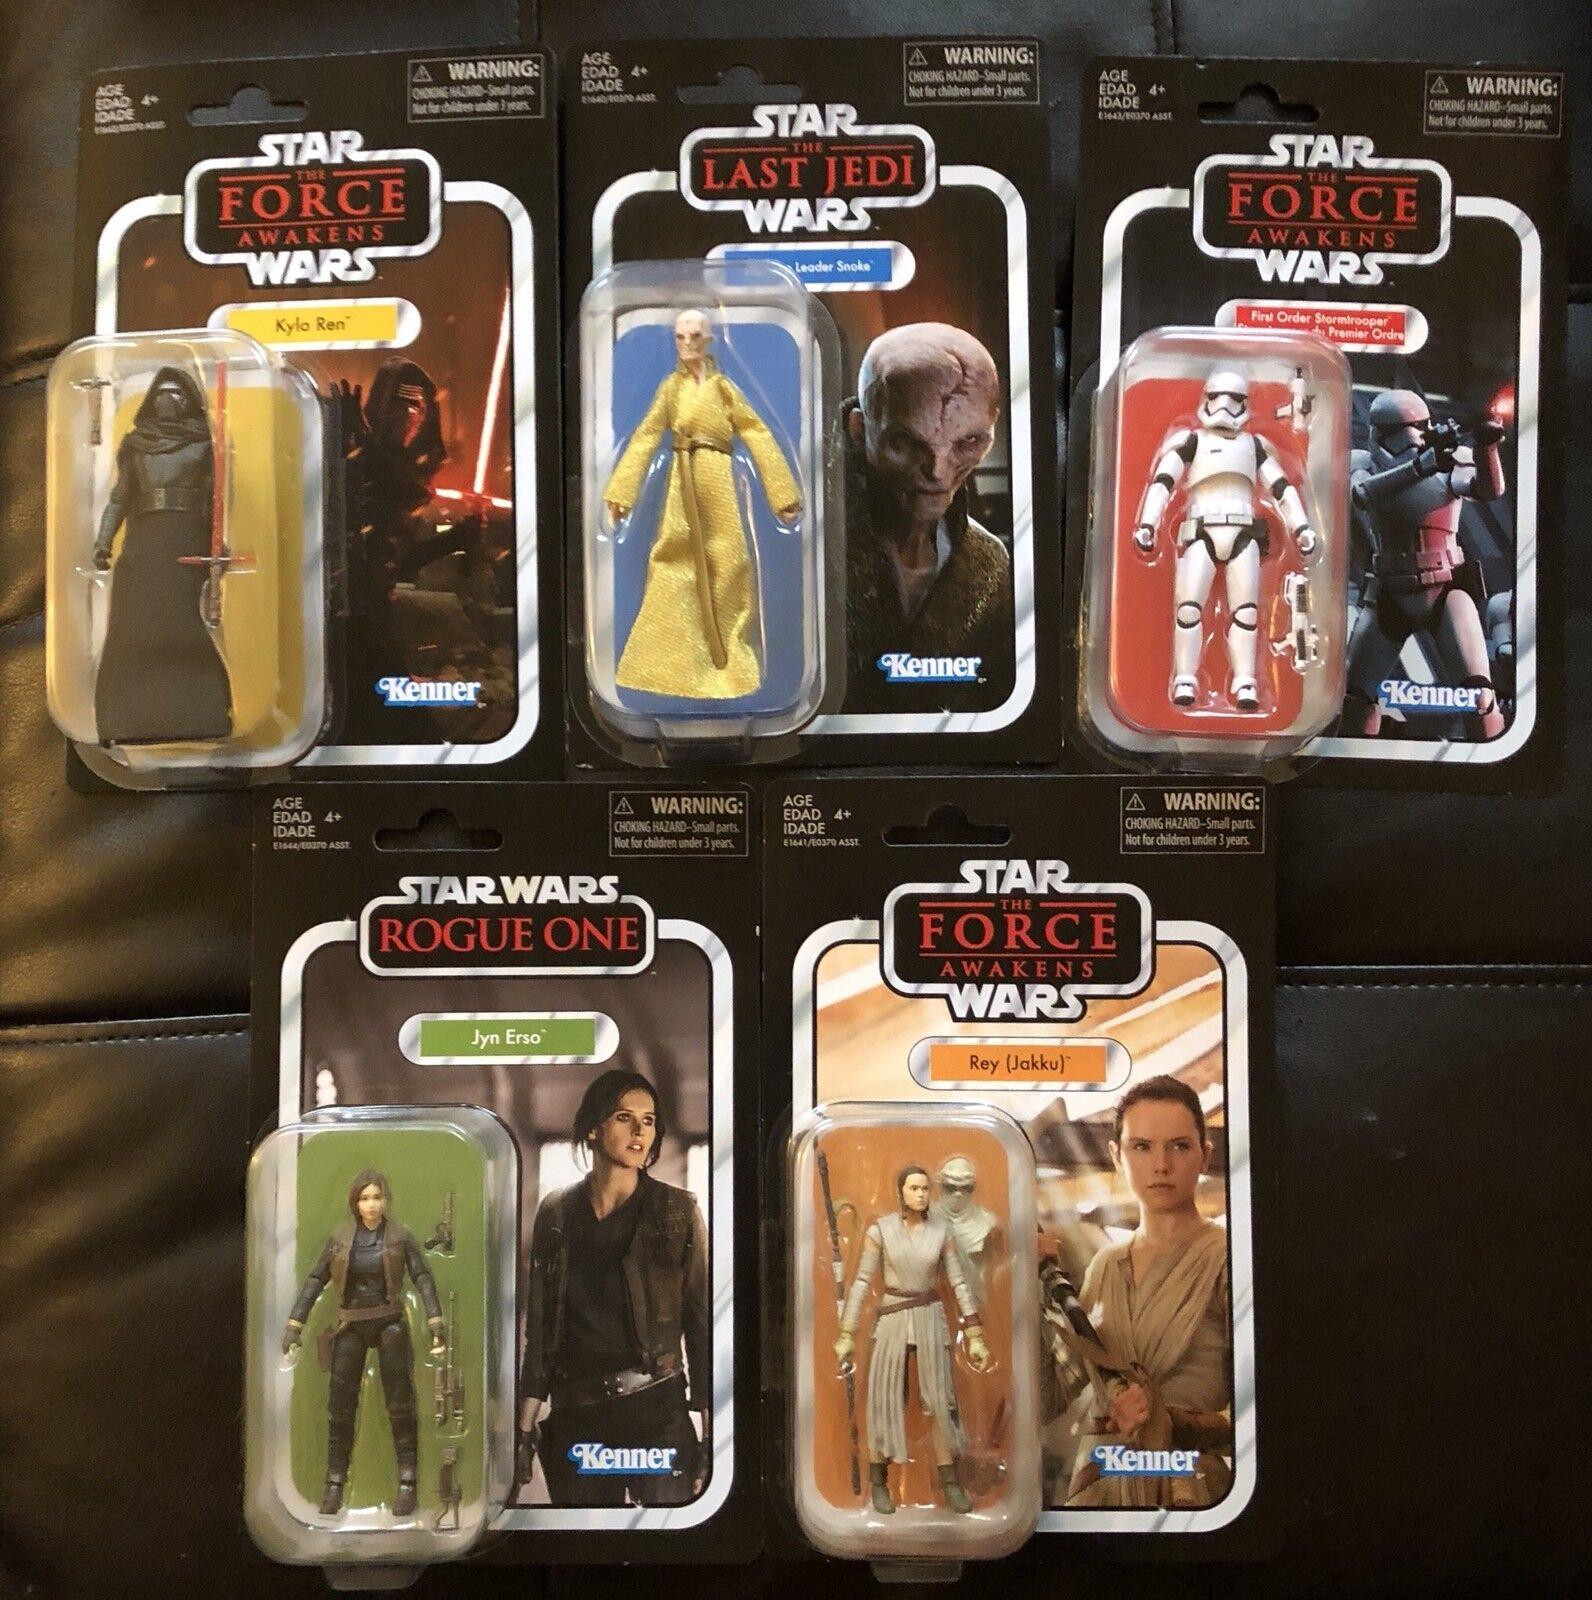 5 Star Wars Vintage Collection Figures Snoke, Kylo Ren, Trooper, Rey, Jyn New